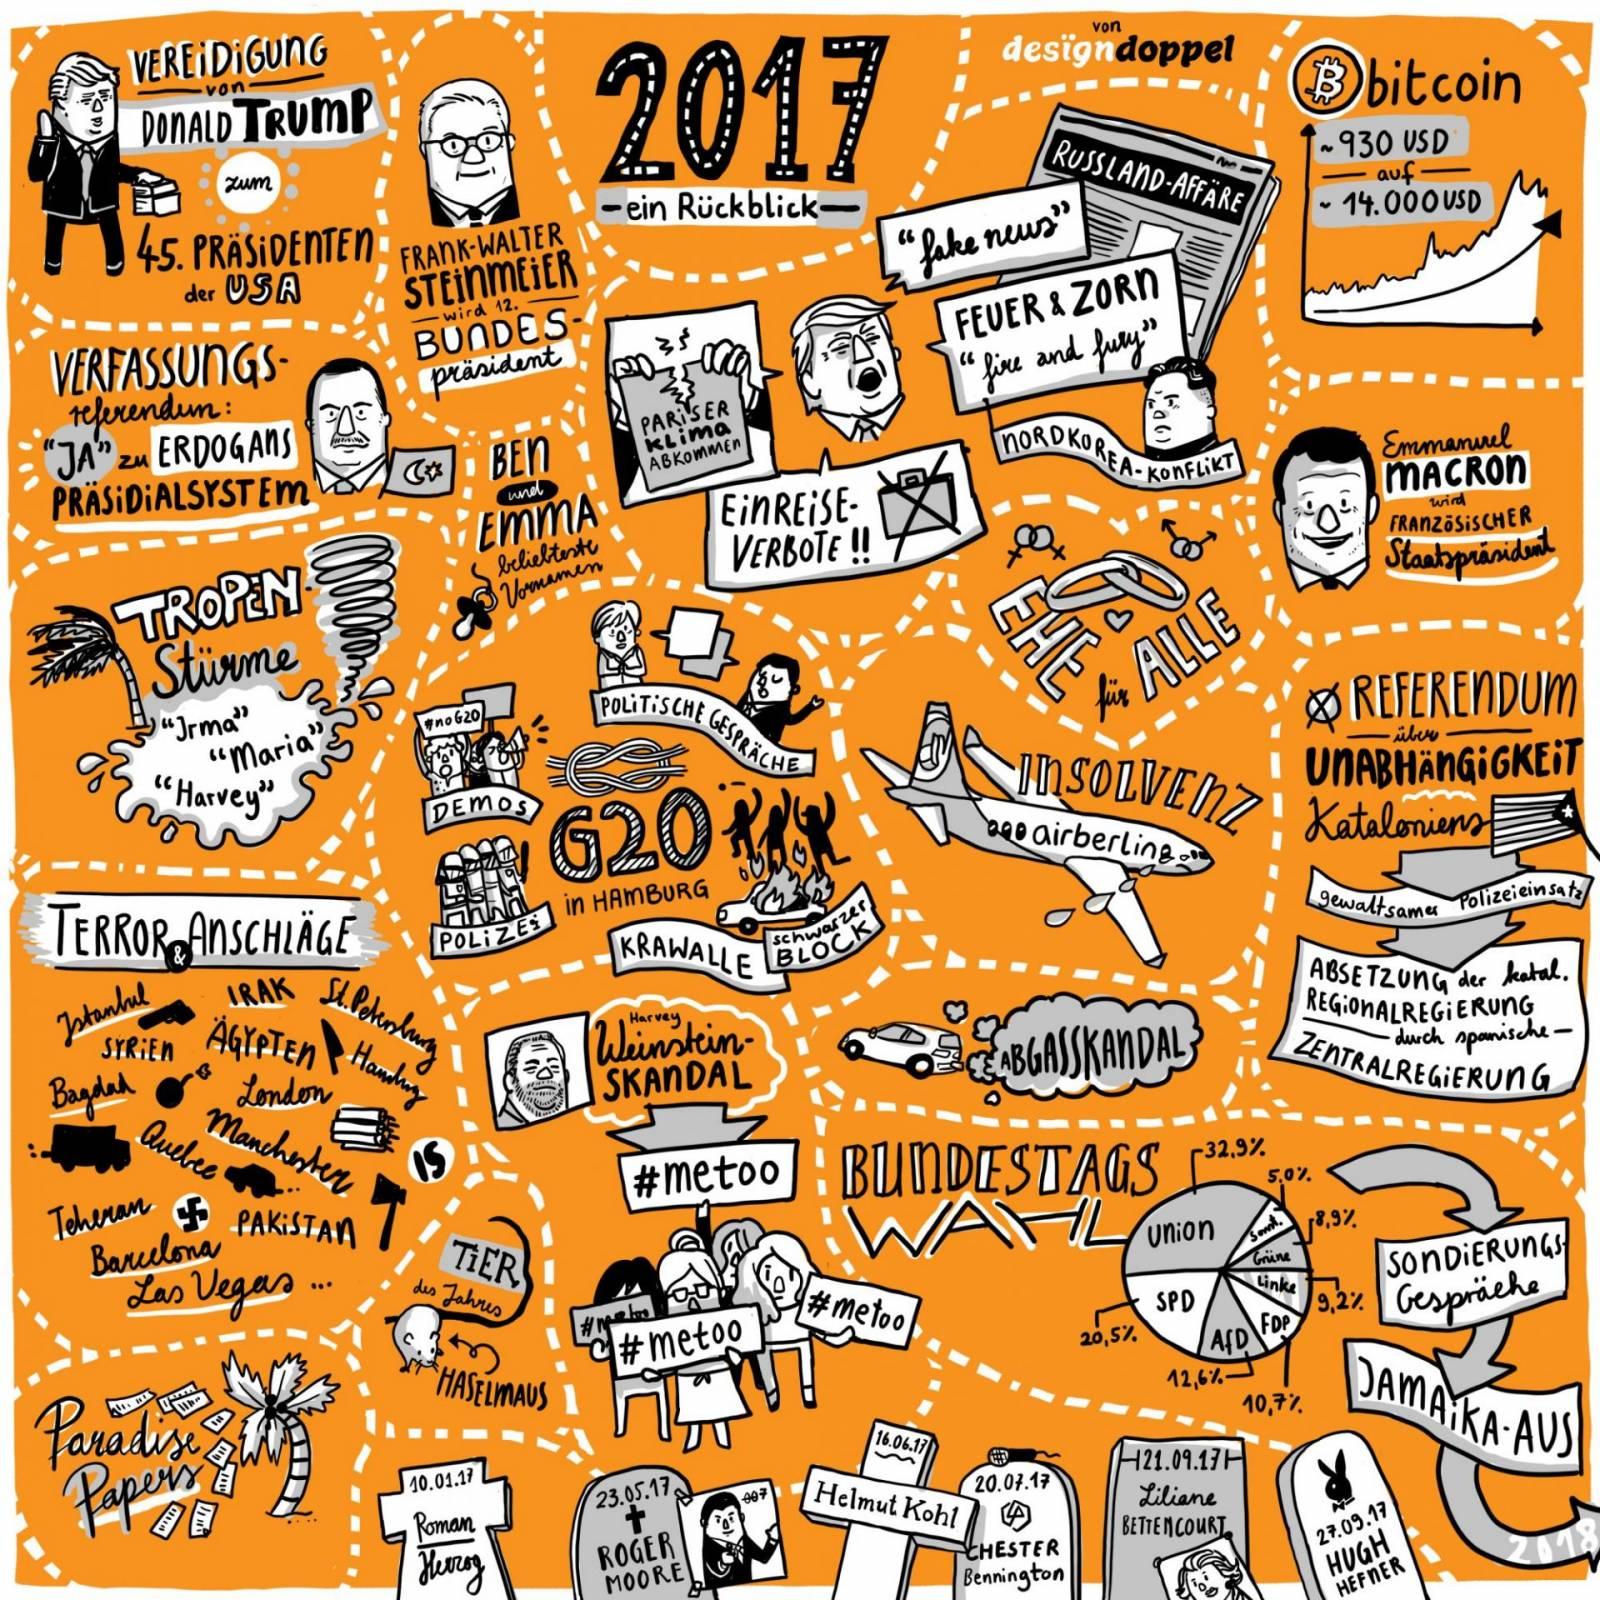 Illustrierter Jahresrückblick 2017